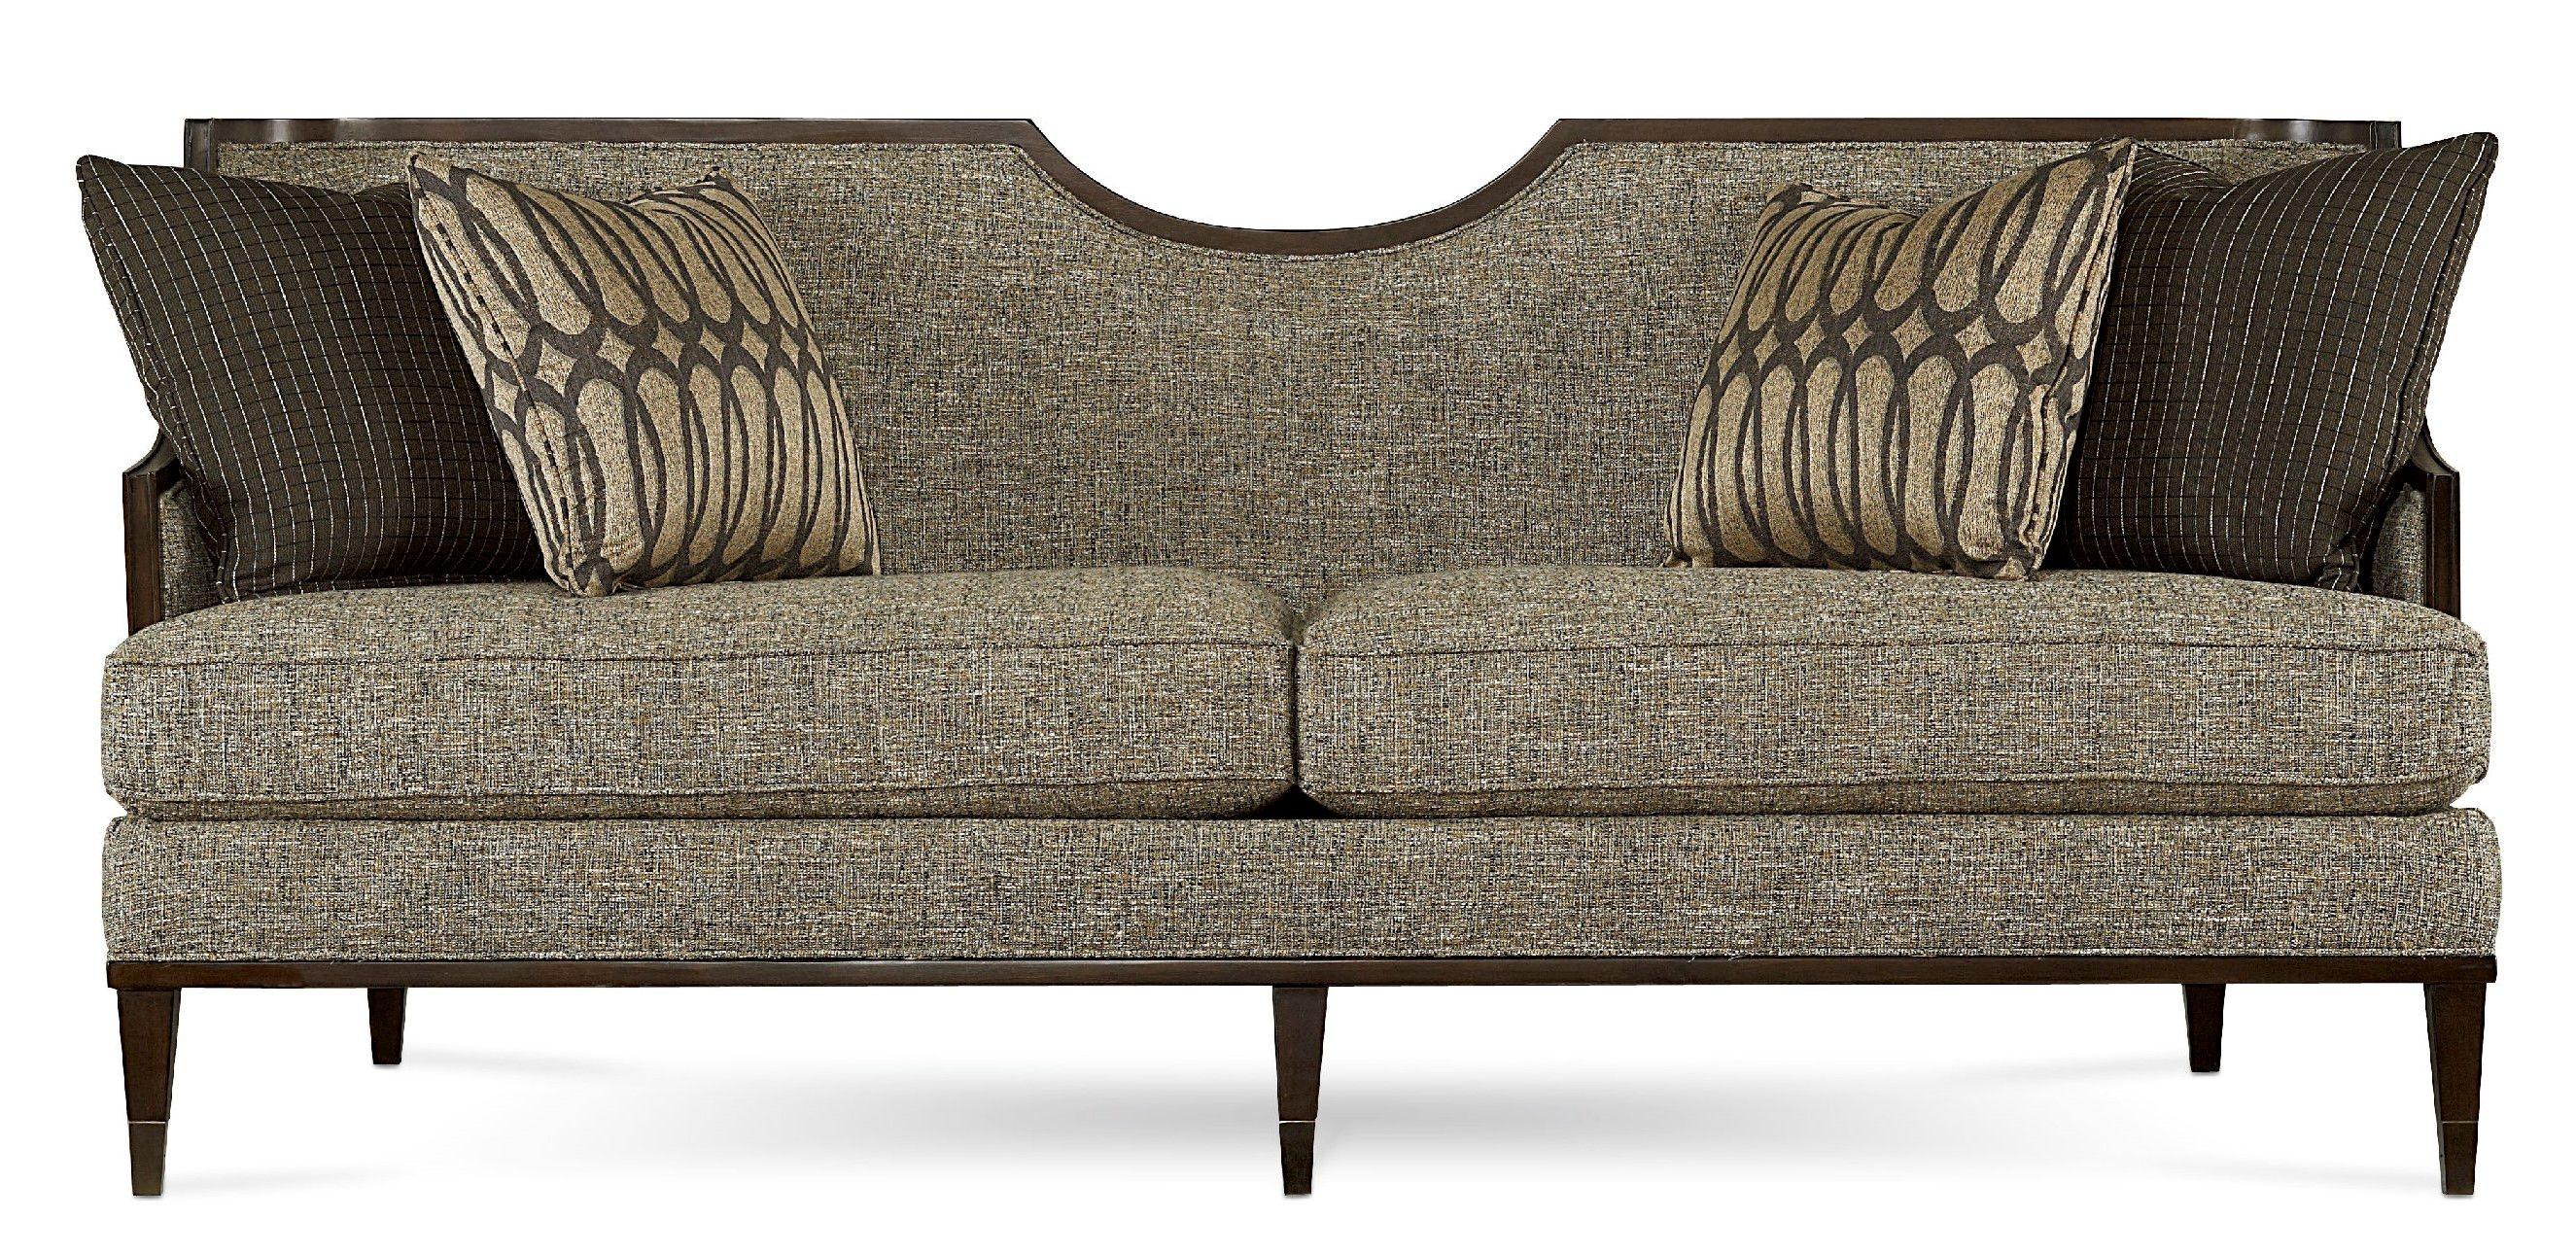 living room sofas carol house furniture maryland heights and rh carolhouse com carol house sectional sofas carol house sofa sleepers